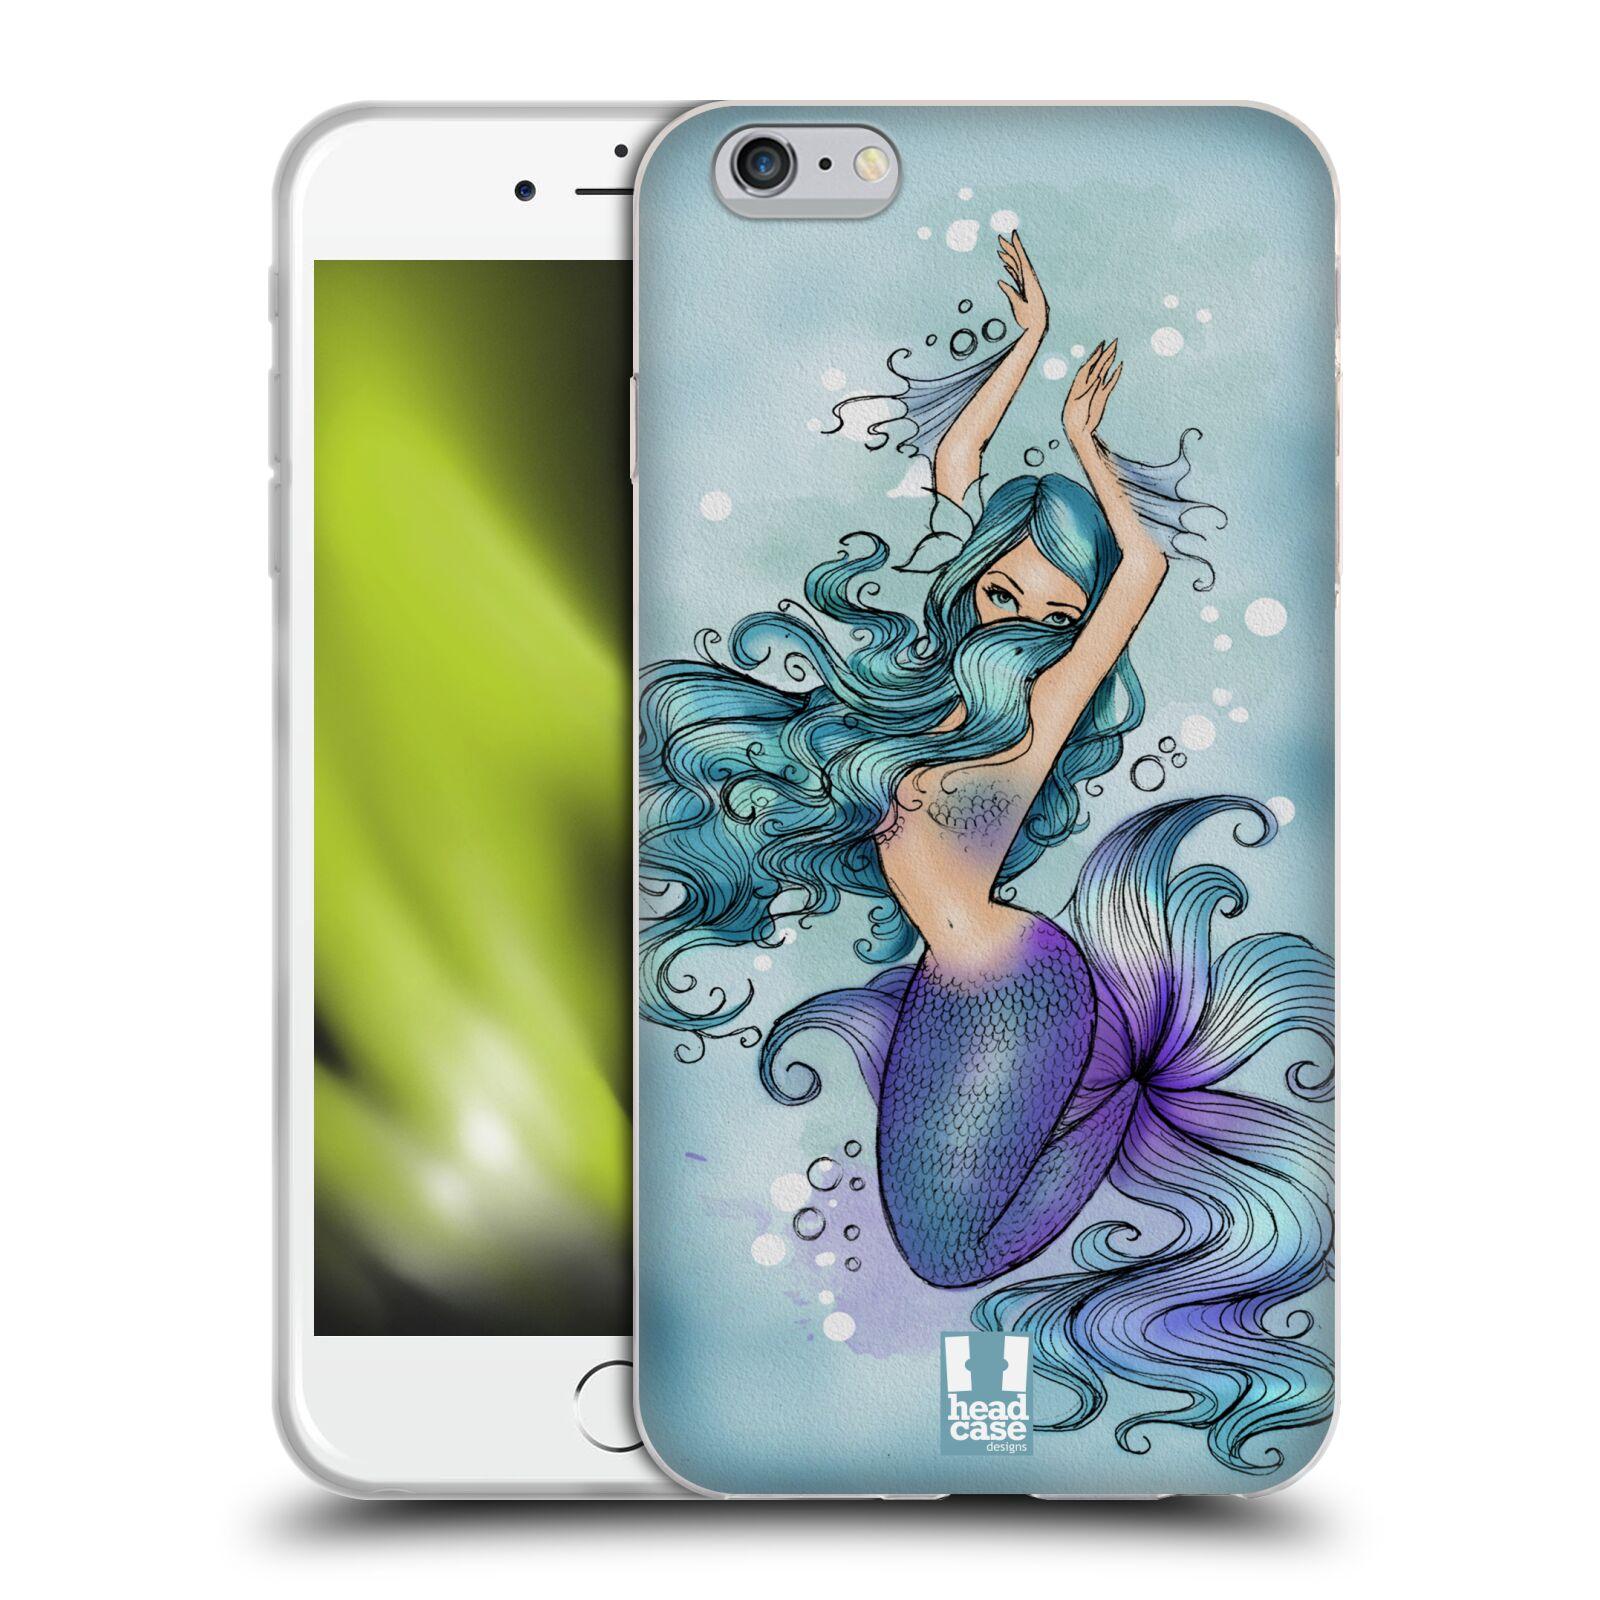 HEAD CASE silikonový obal na mobil Apple Iphone 6 PLUS/ 6S PLUS vzor Mořská víla MODRÁ